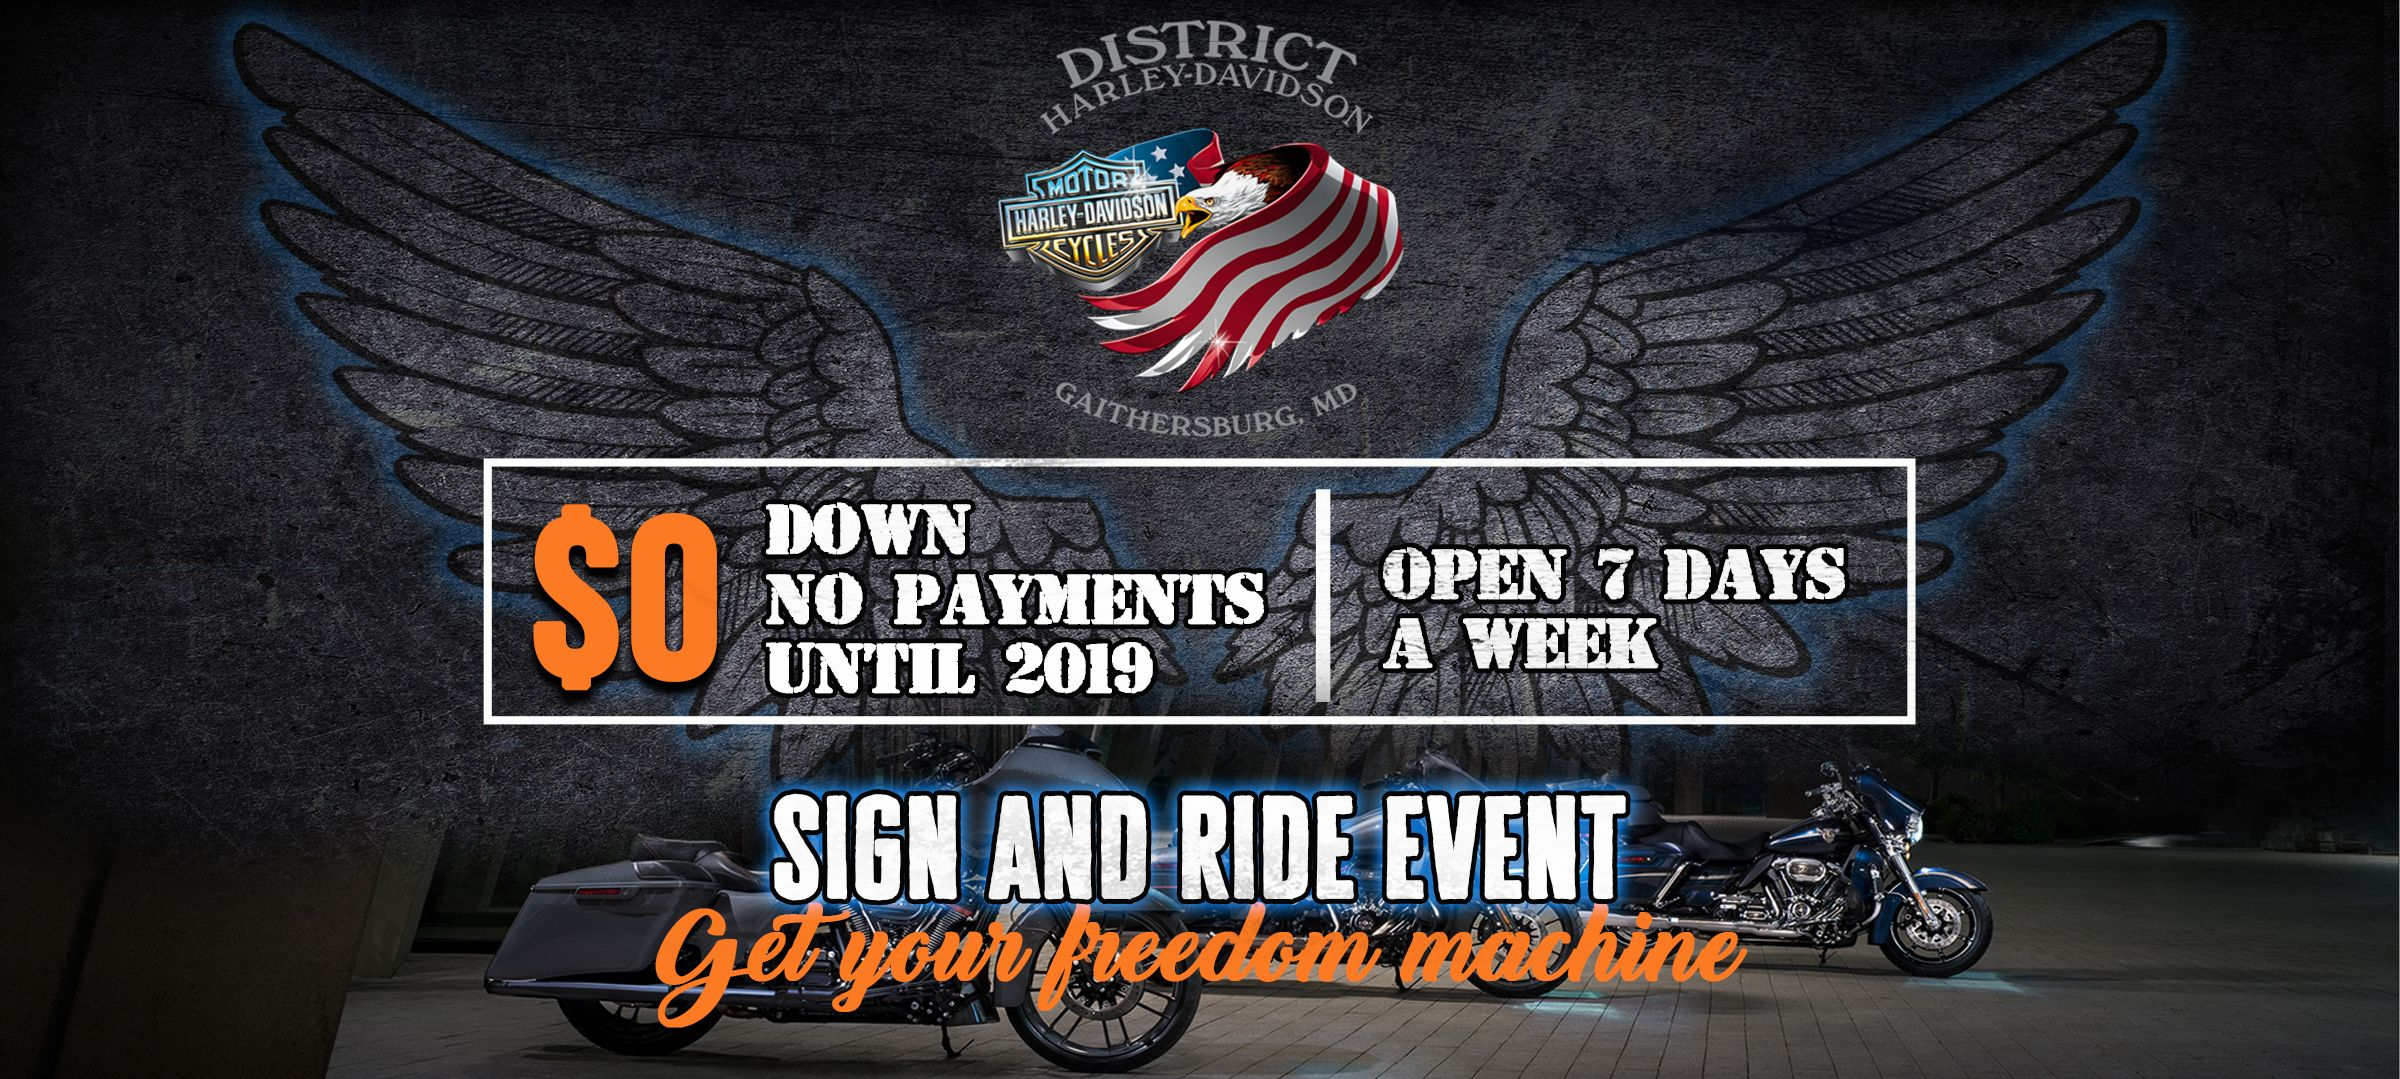 New & Used Motorcycle Dealer | District Harley-Davidson®